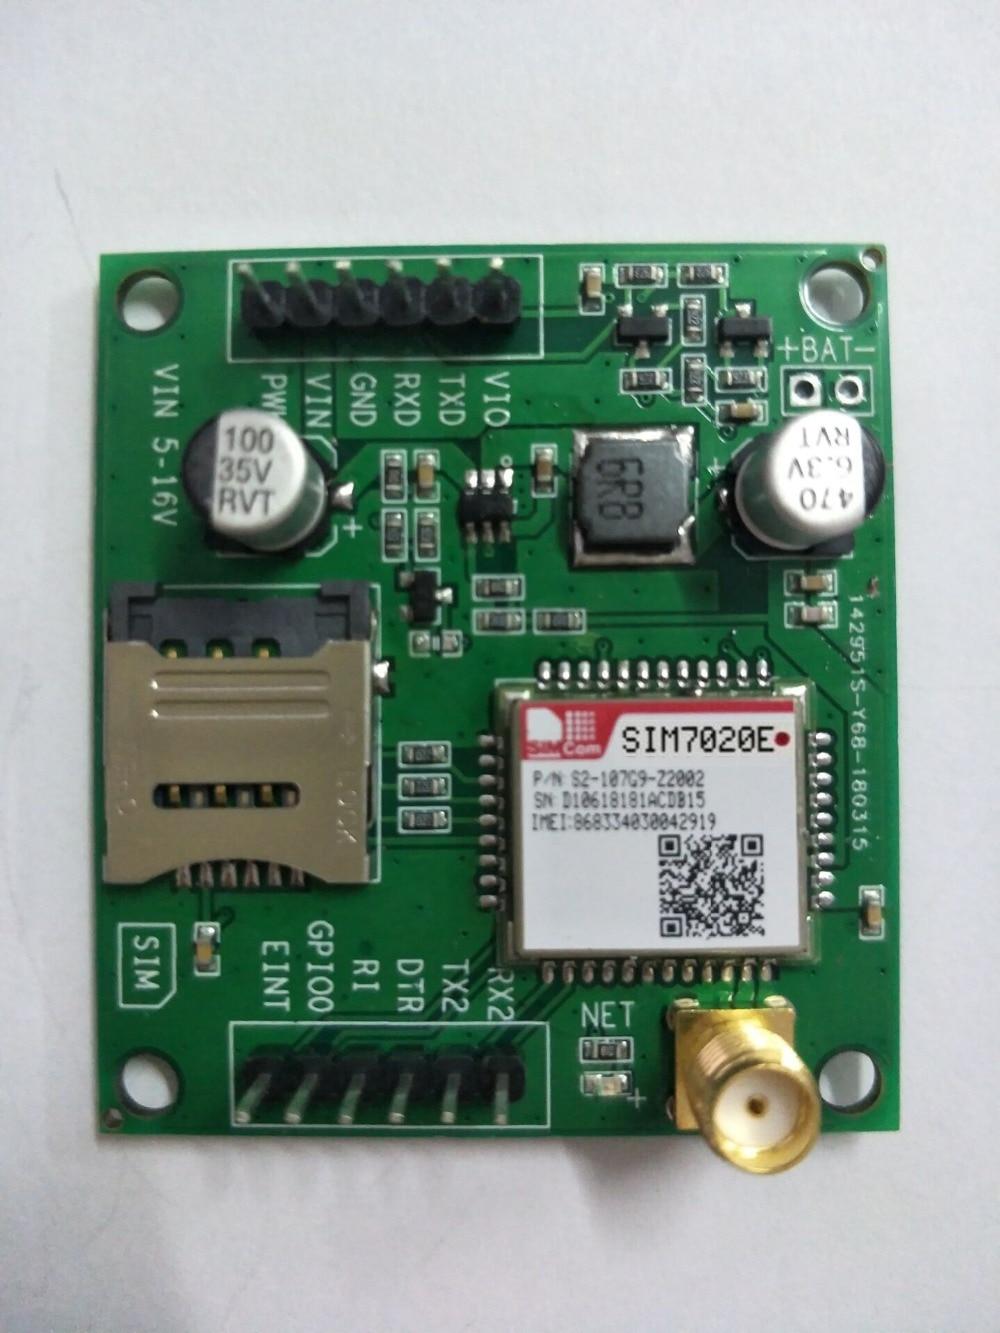 SIMCOM SIM7020 SIM7020E Development Board Multi-Band B1/B3/B5/B8/B20/B28 LTE NB-IoT M2M Module Compatible With SIM800C